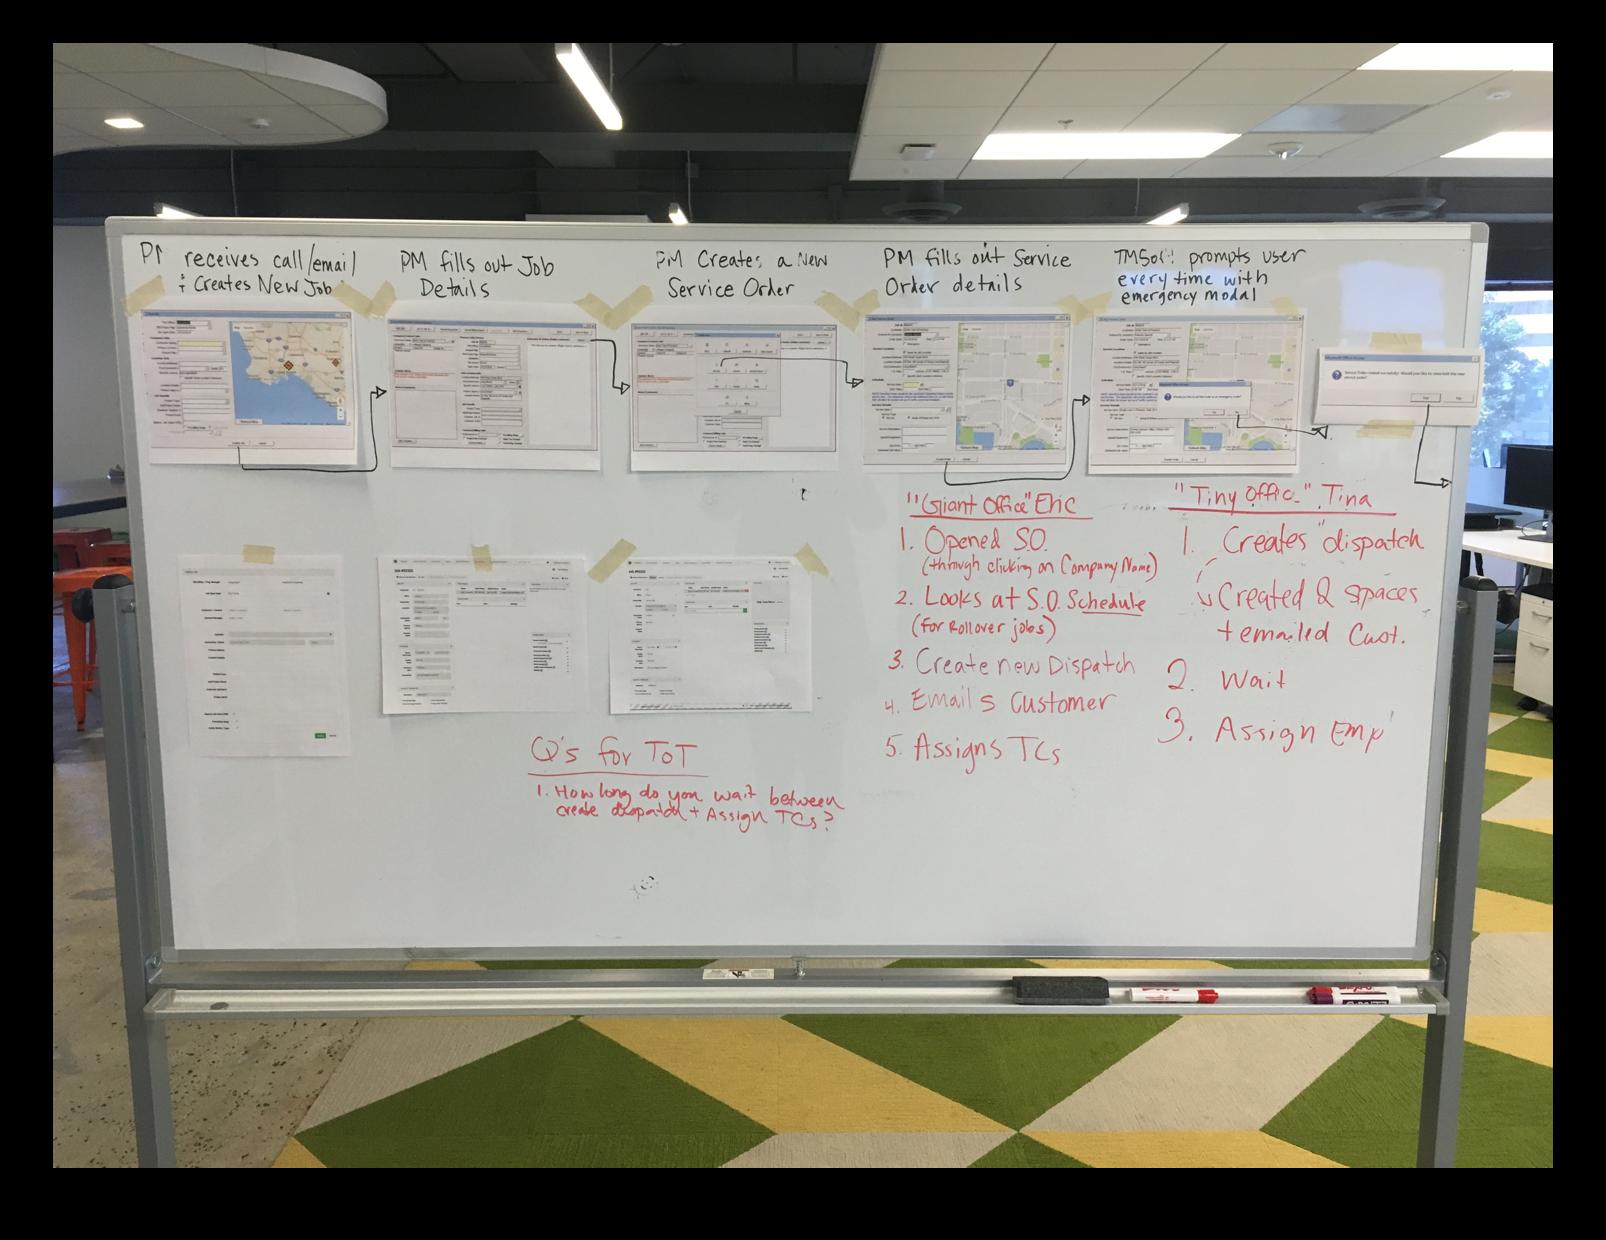 Enterprise Dispatch System — Samantha Burke